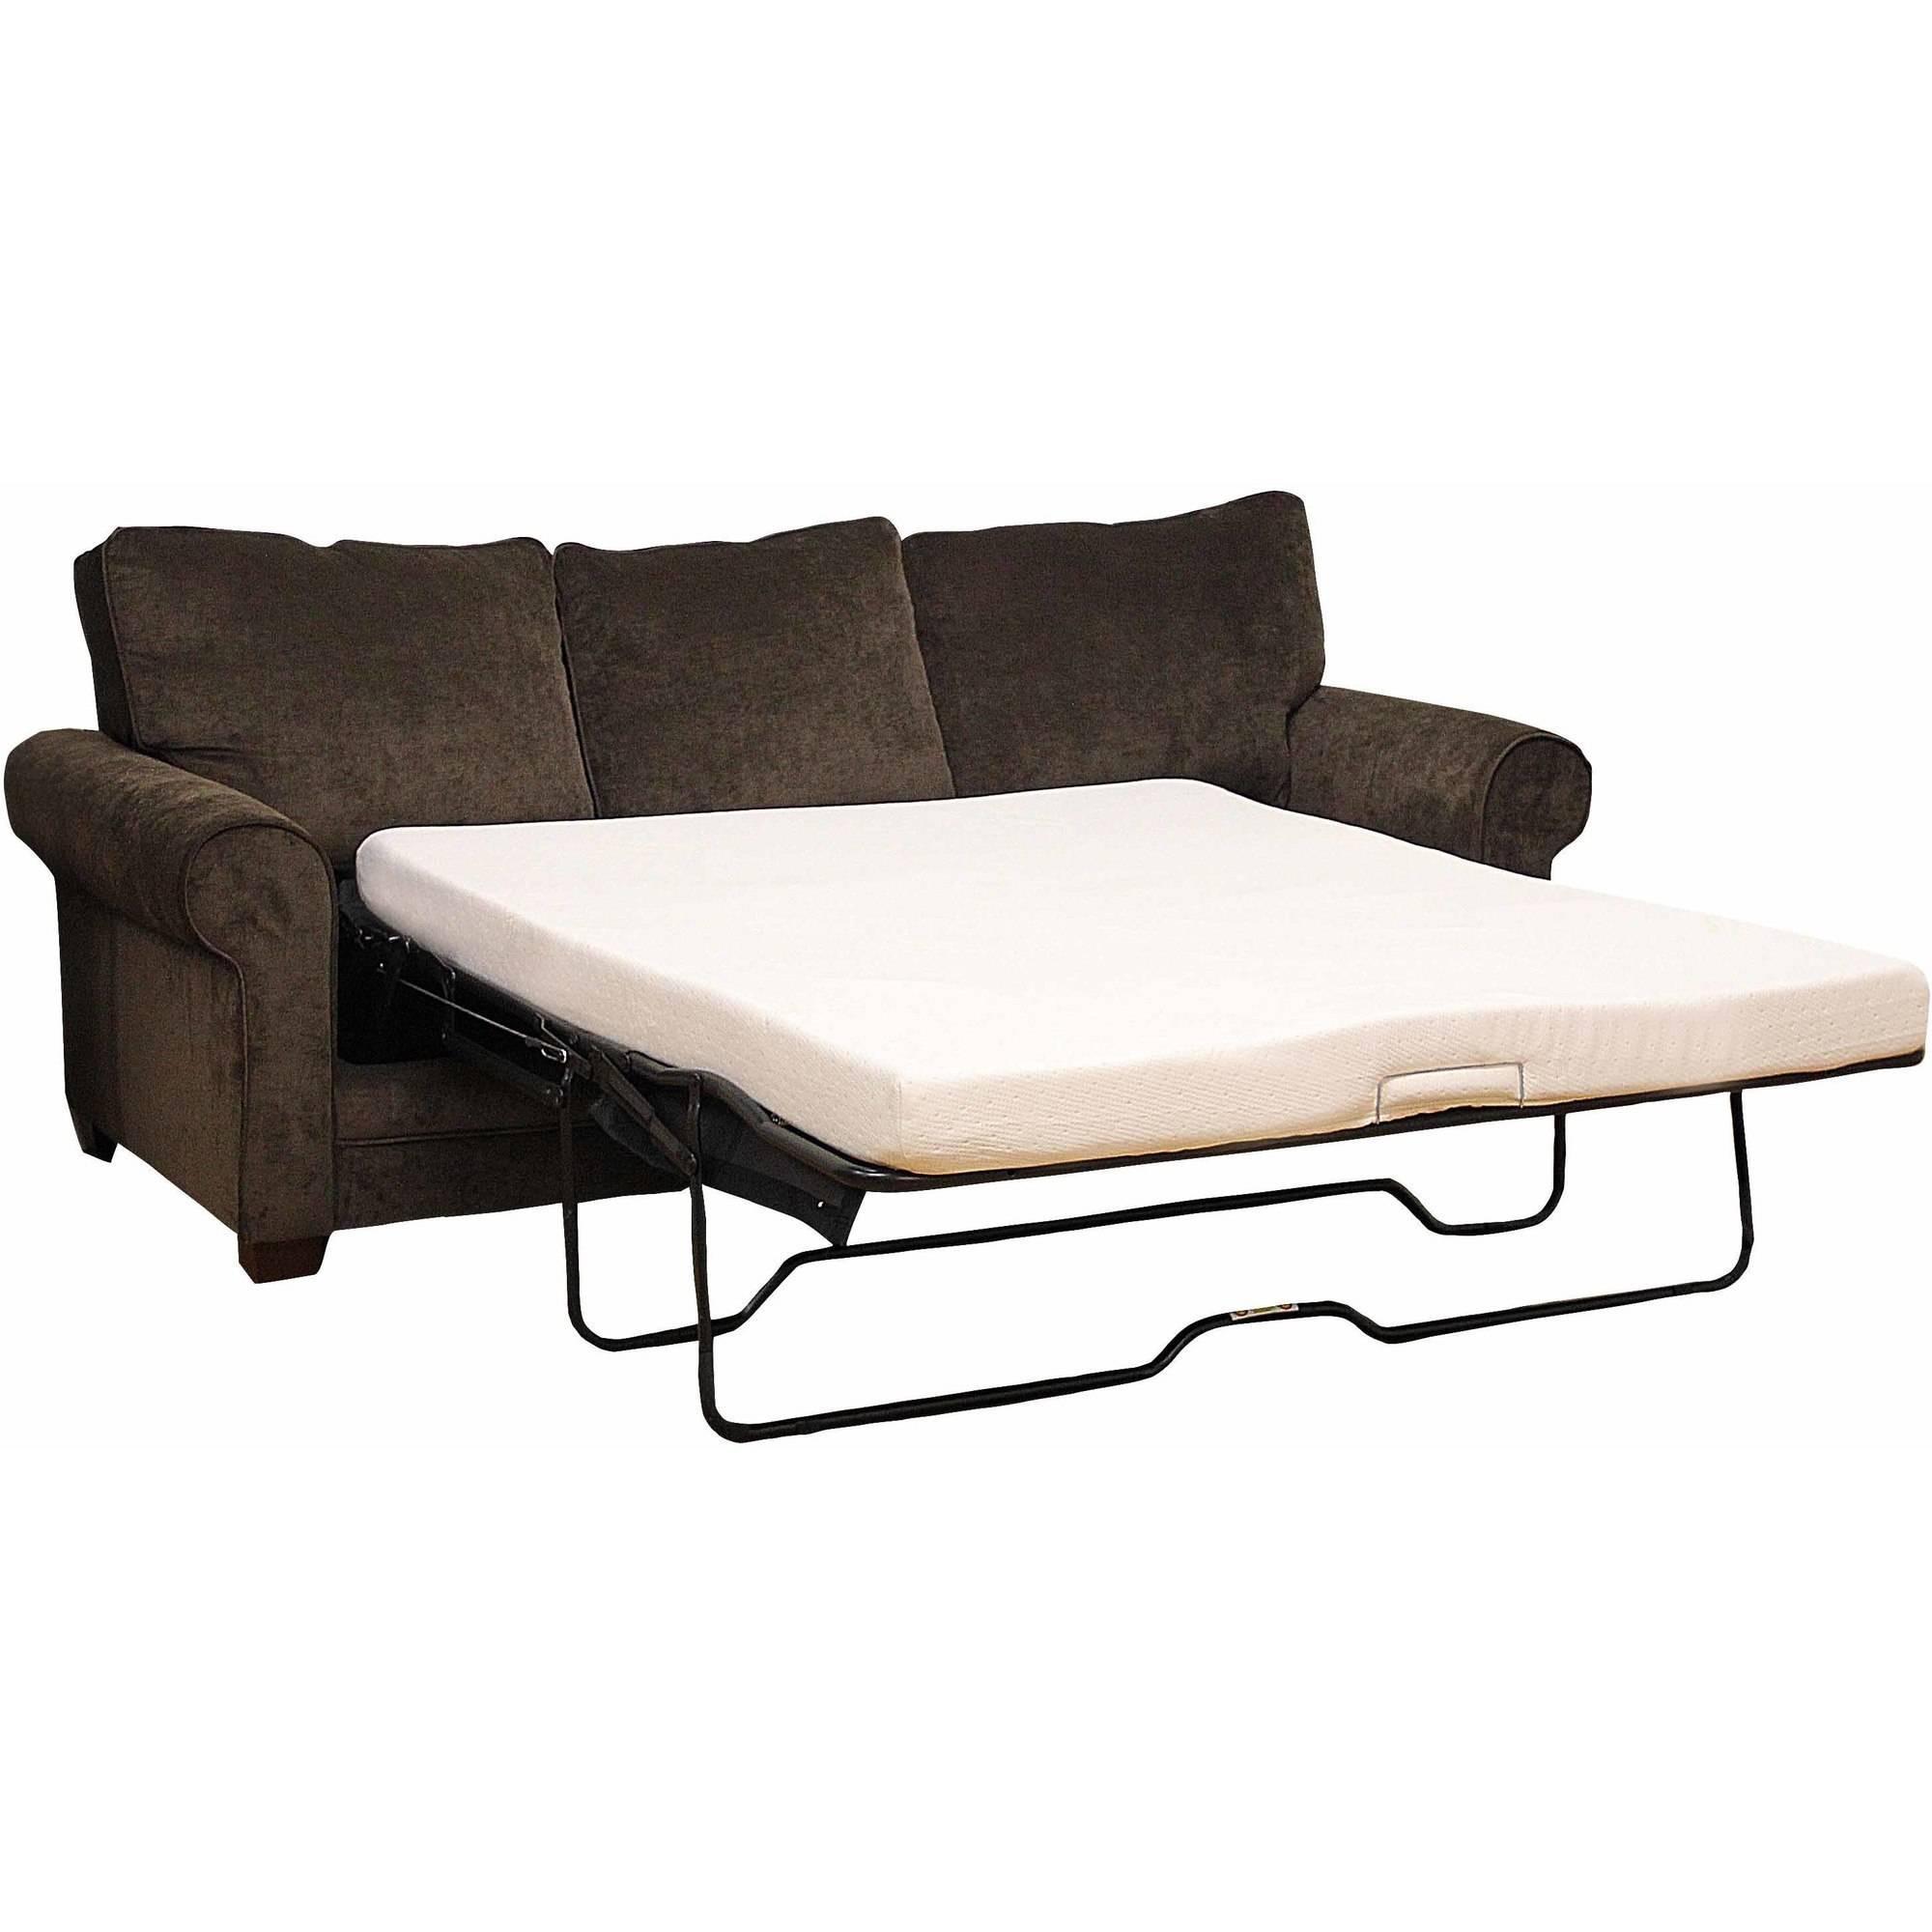 Upgrading Sleep Number Bed